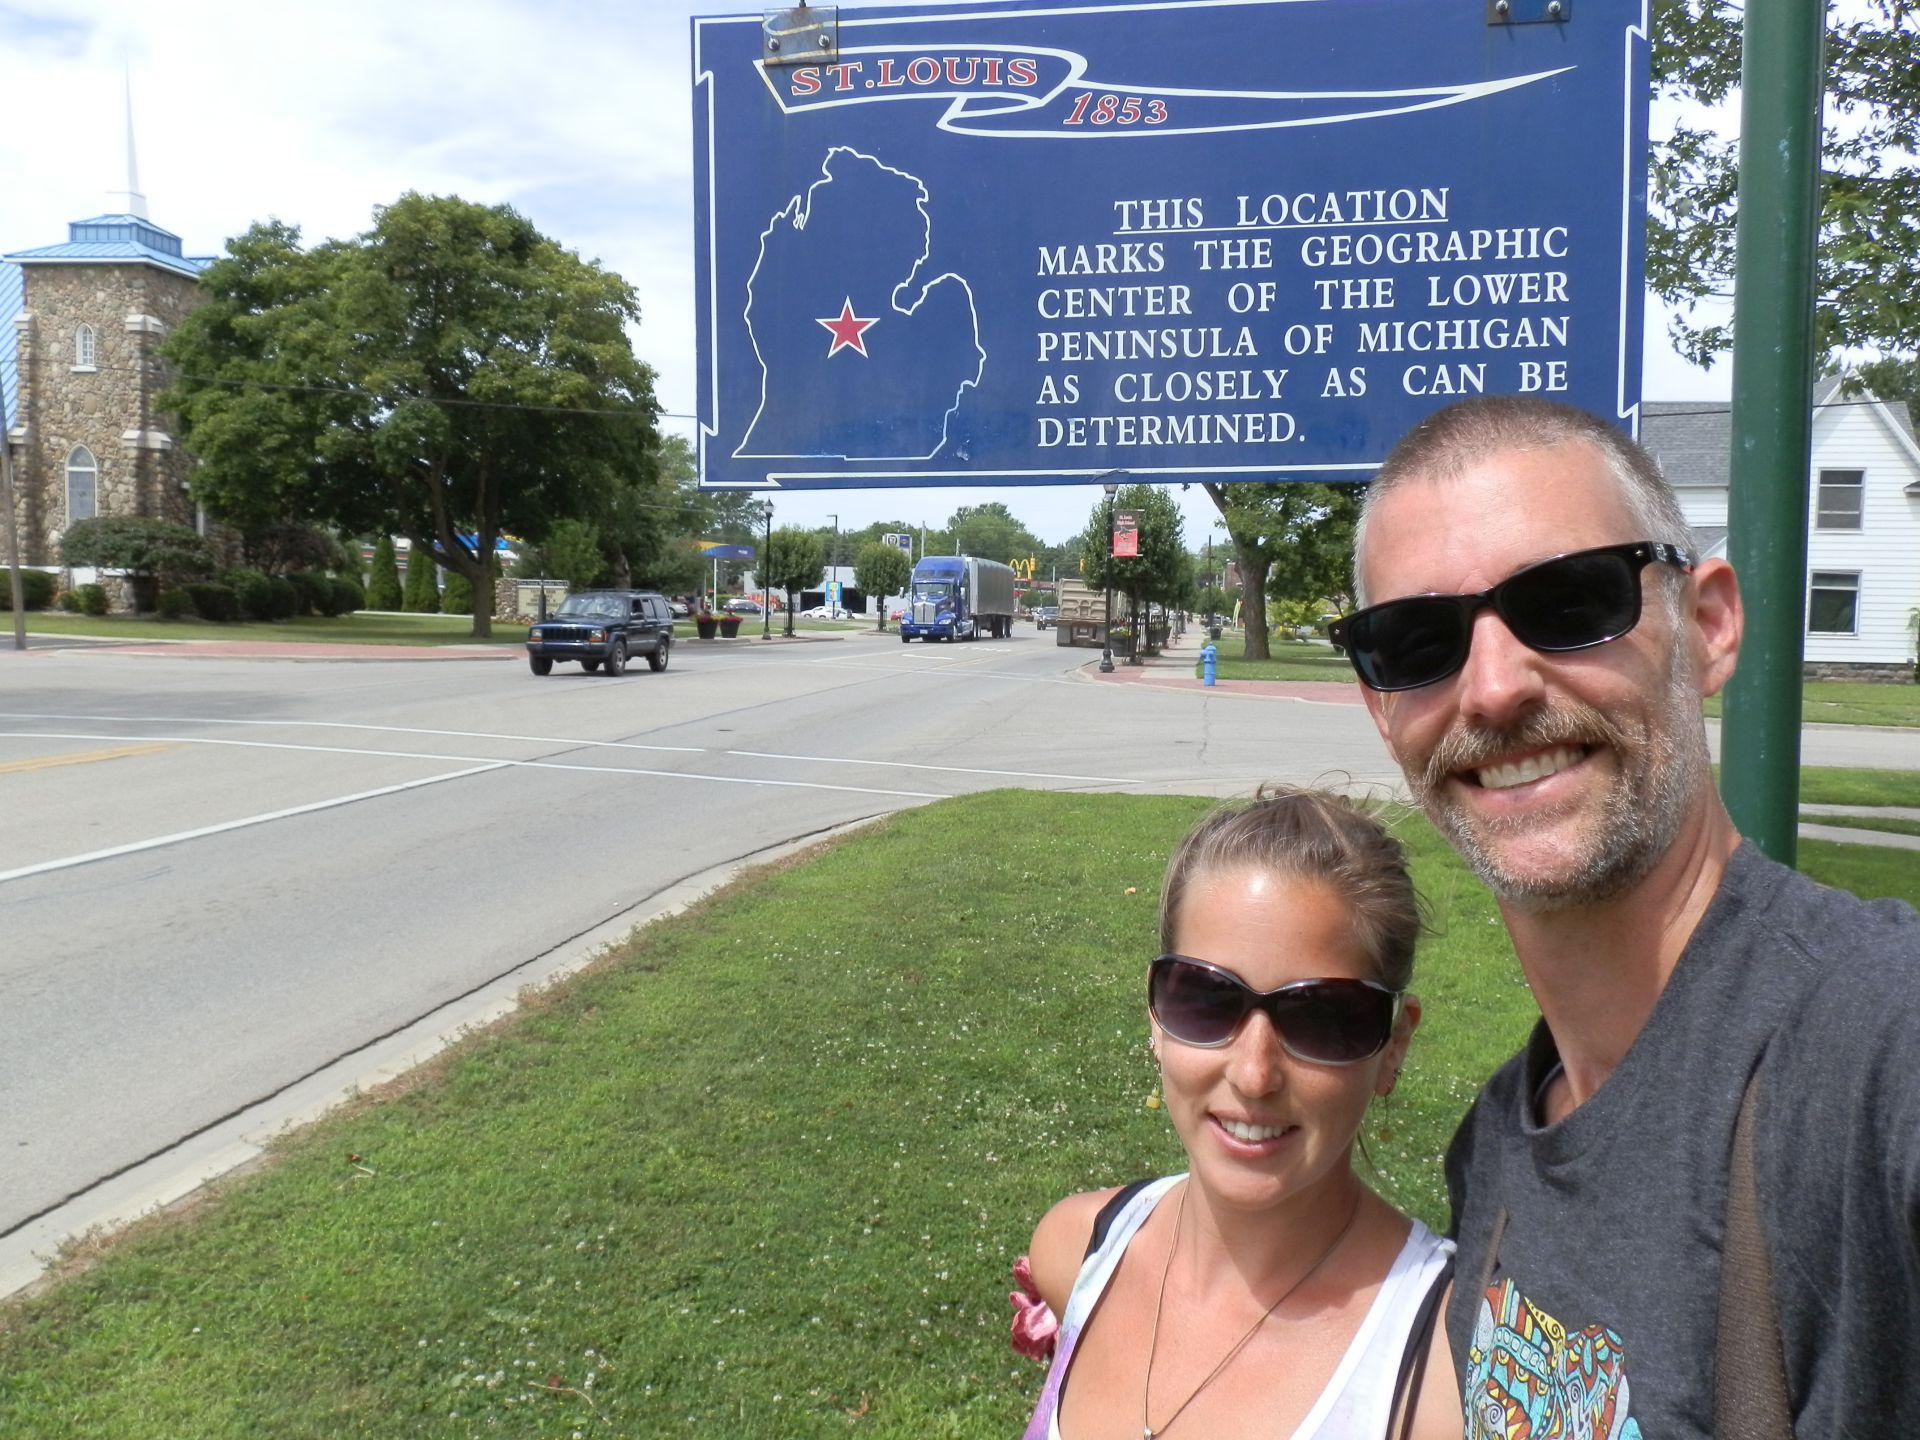 Matt & Erica in St. Louis, Michigan- The geographic center of the Mitten